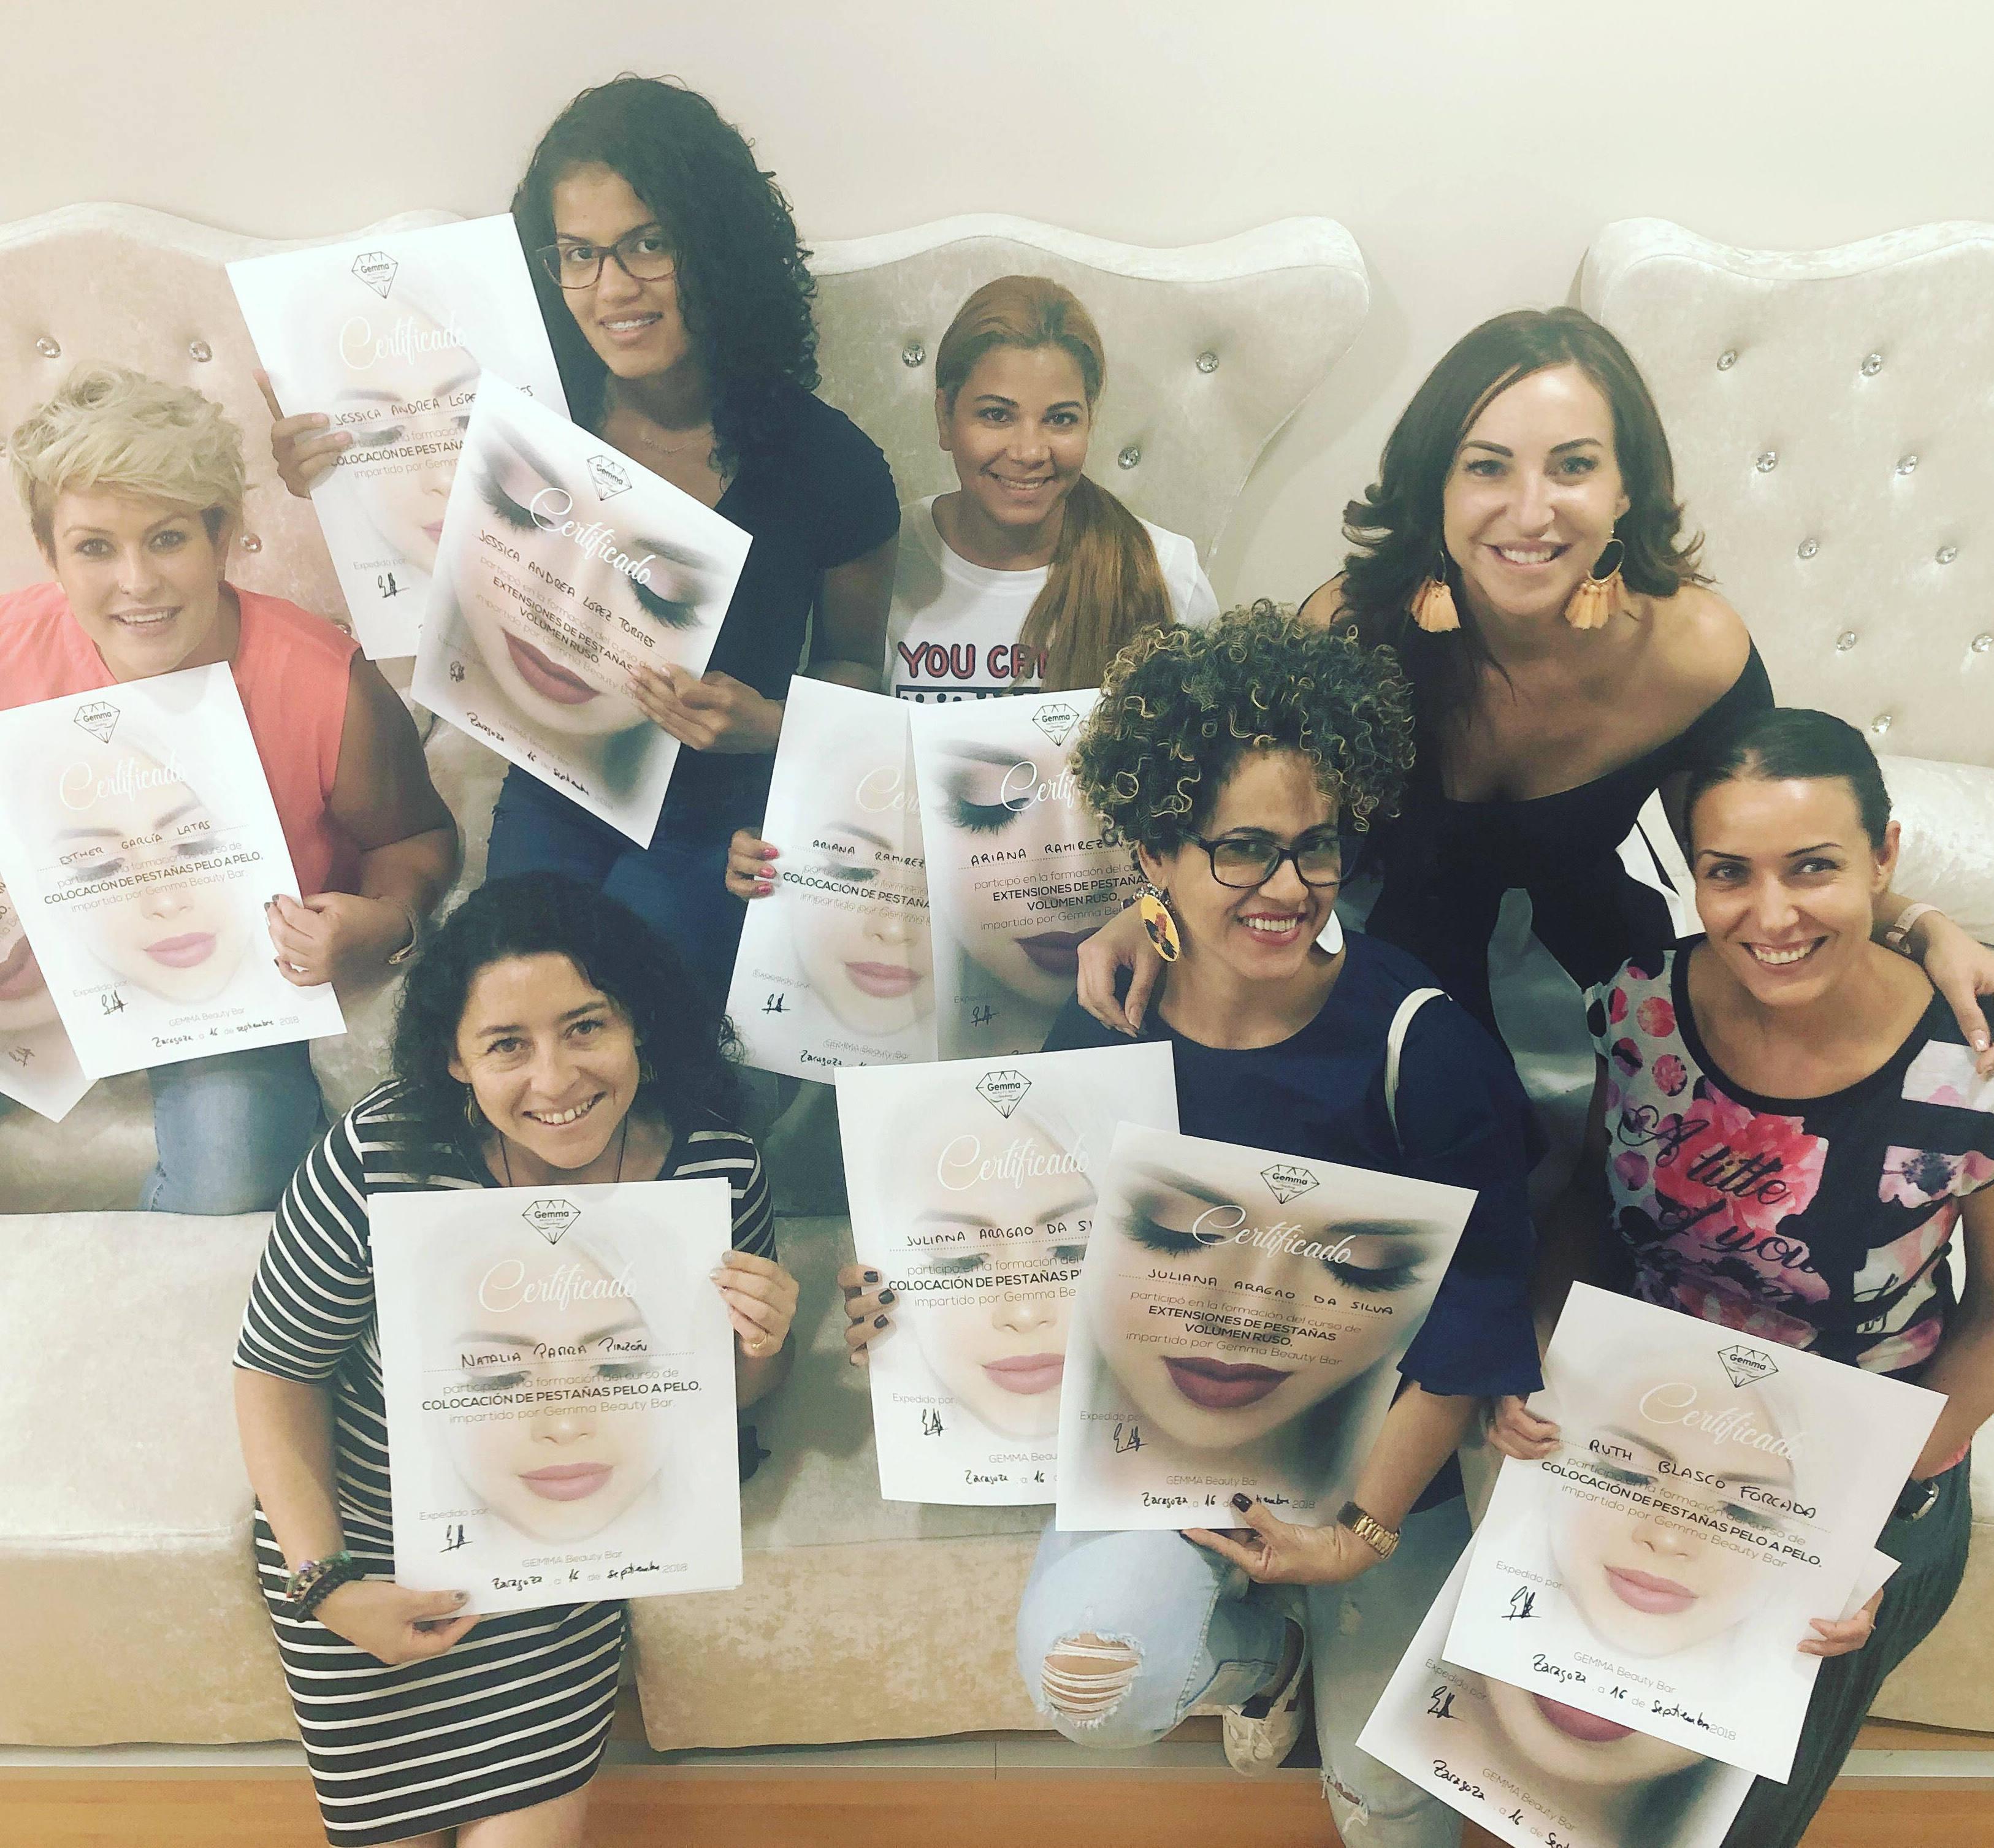 Foto 7 de Centros de estética en Zaragoza | Gemma Beauty Bar